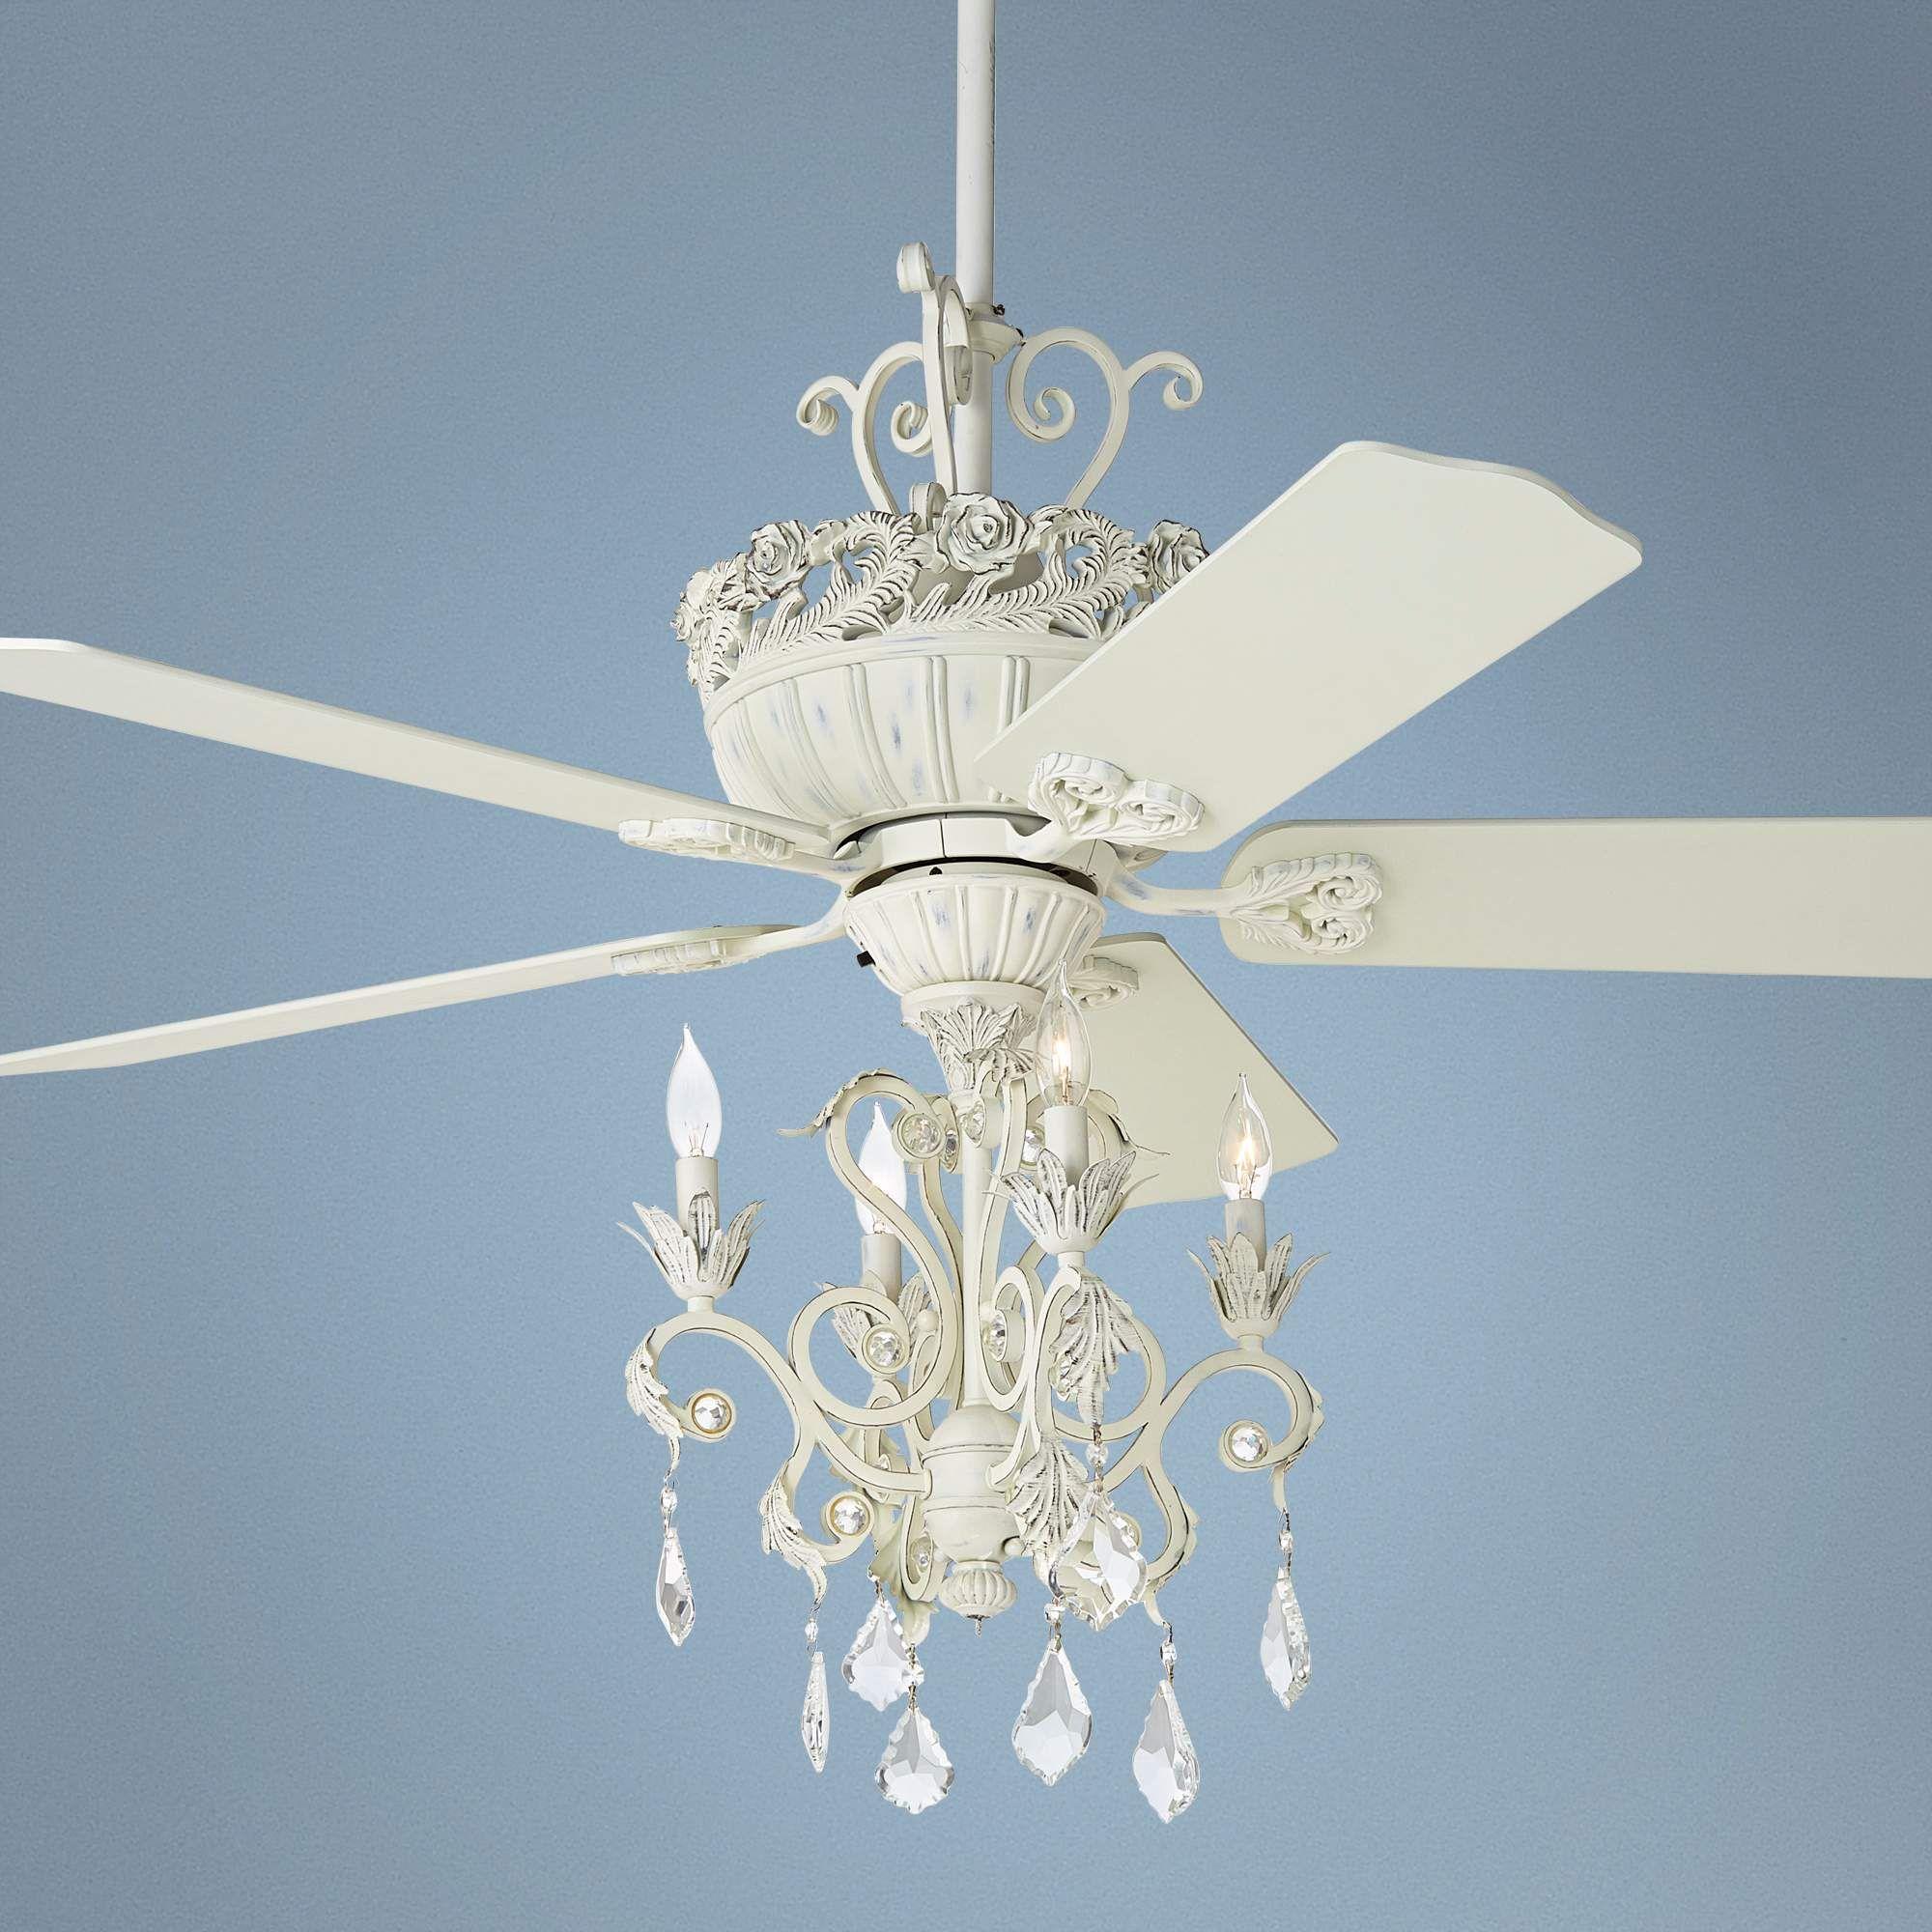 52 casa chic rubbed white chandelier ceiling fan style 12277 52 casa chic rubbed white chandelier ceiling fan 12277 4g156 lamps plus arubaitofo Gallery